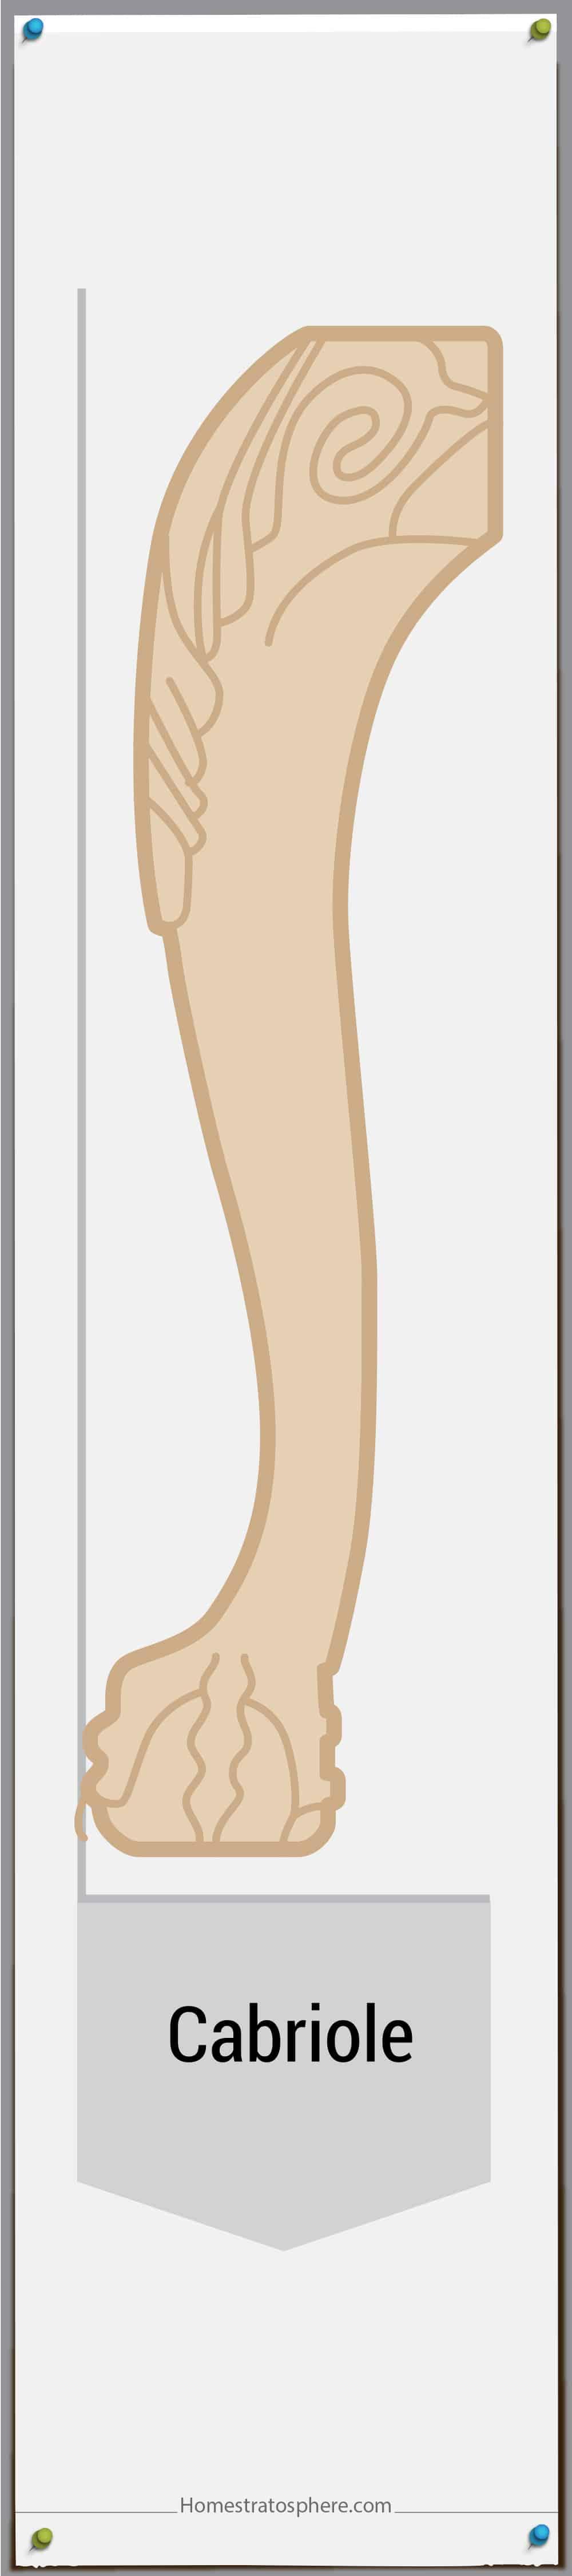 Cabriole leg style 3